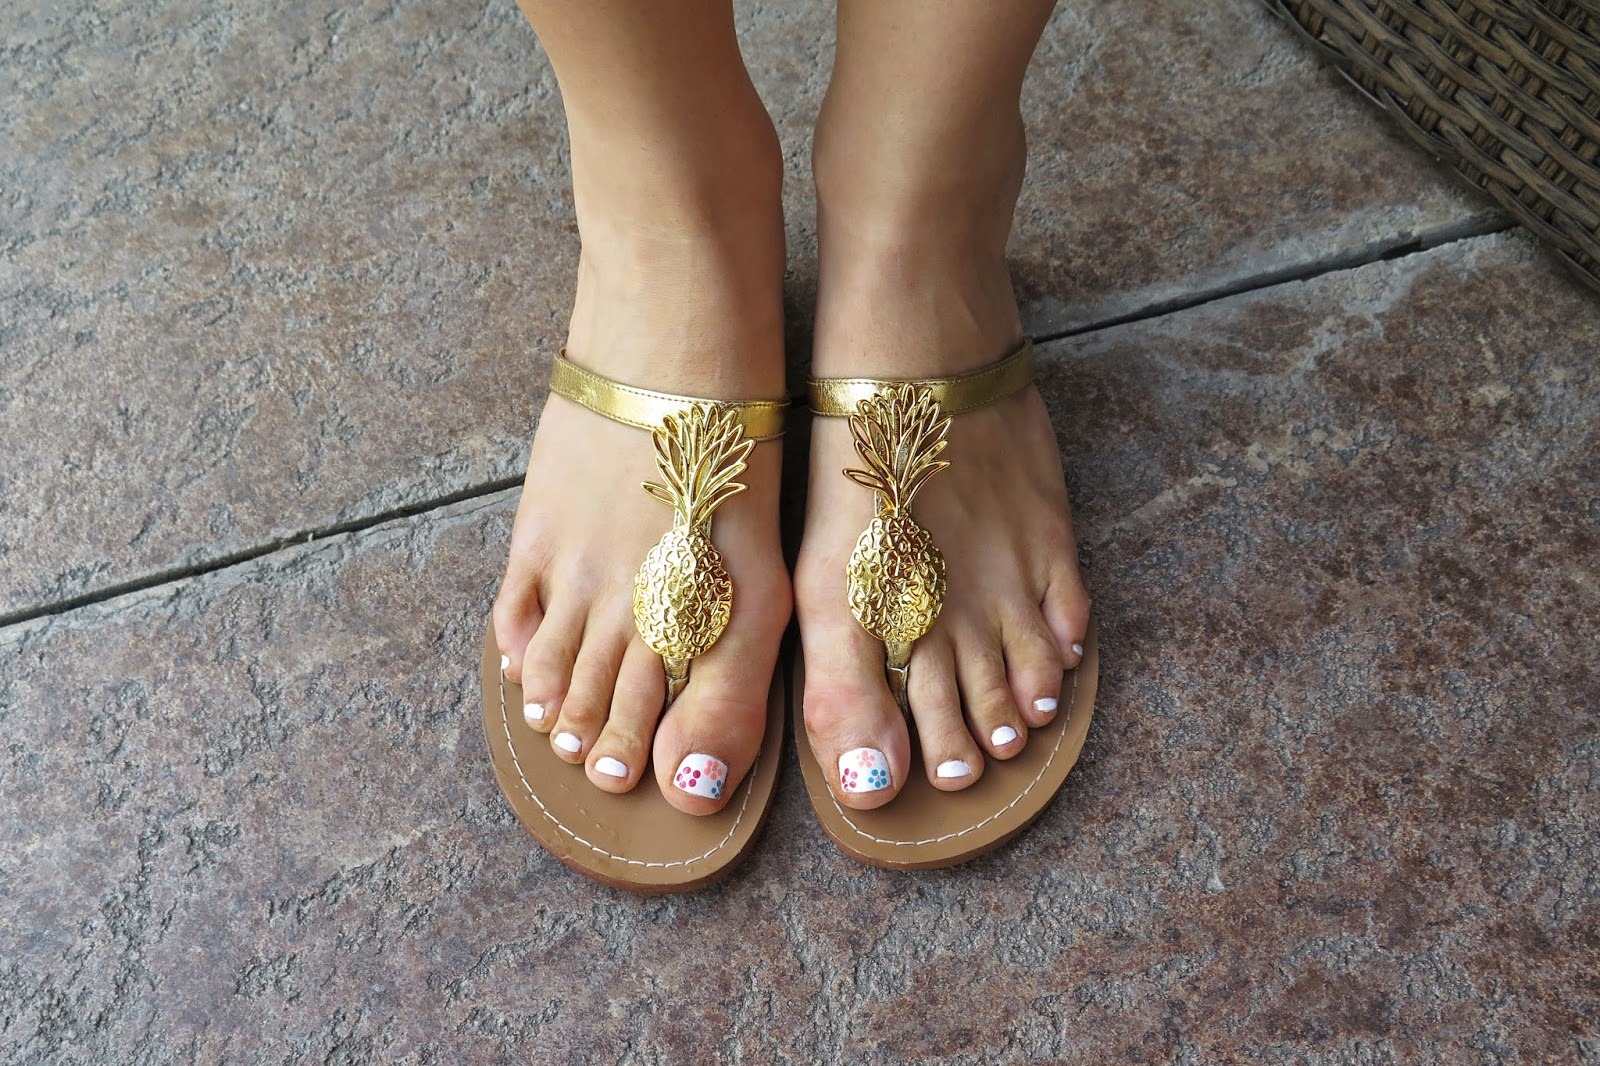 gold-sandals-cute-manicure-tropical-toenails